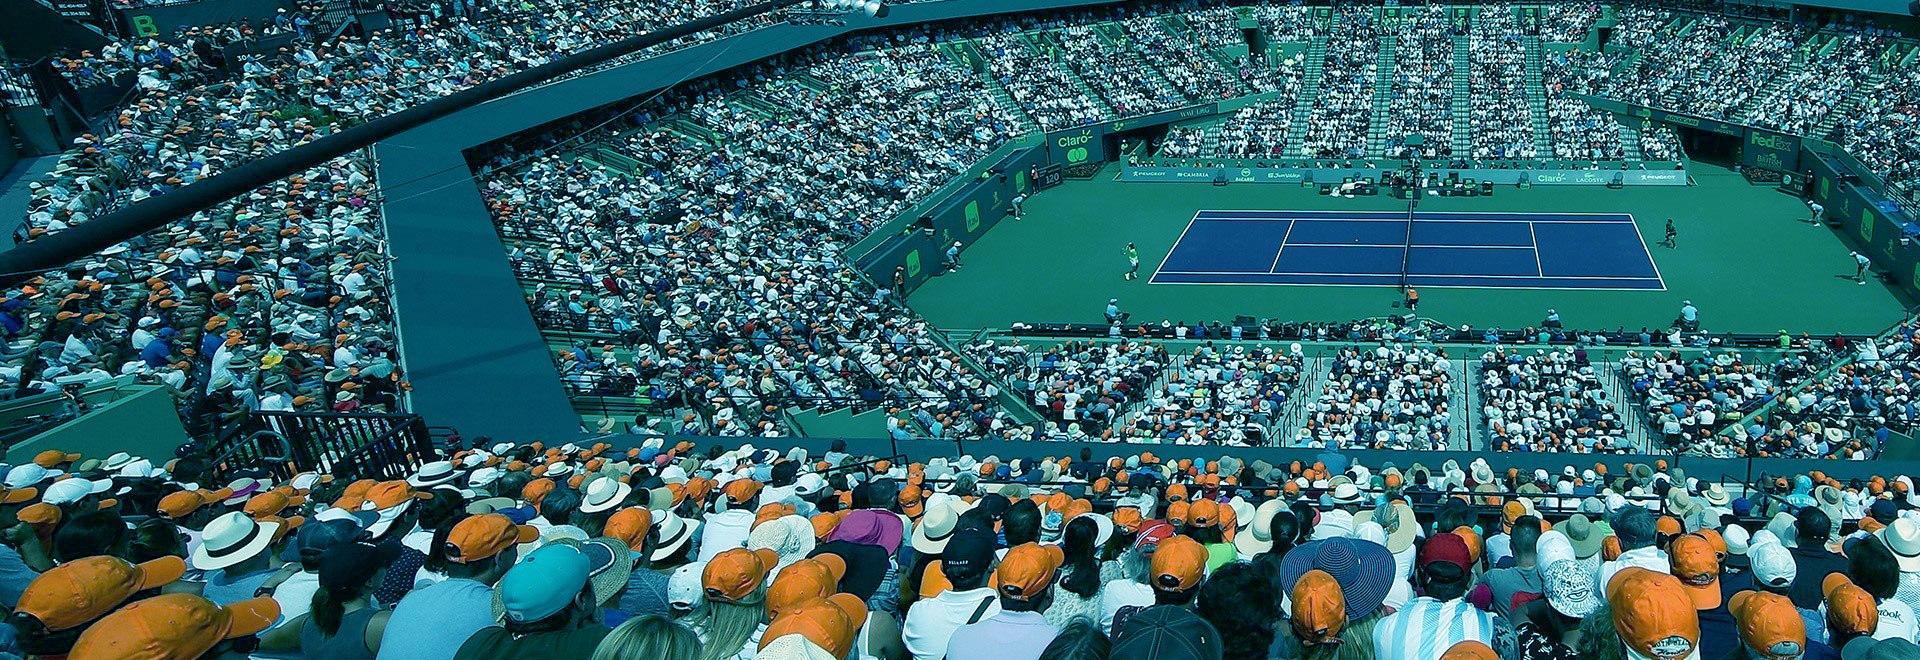 Federer - Kyrgios. 2a semifinale